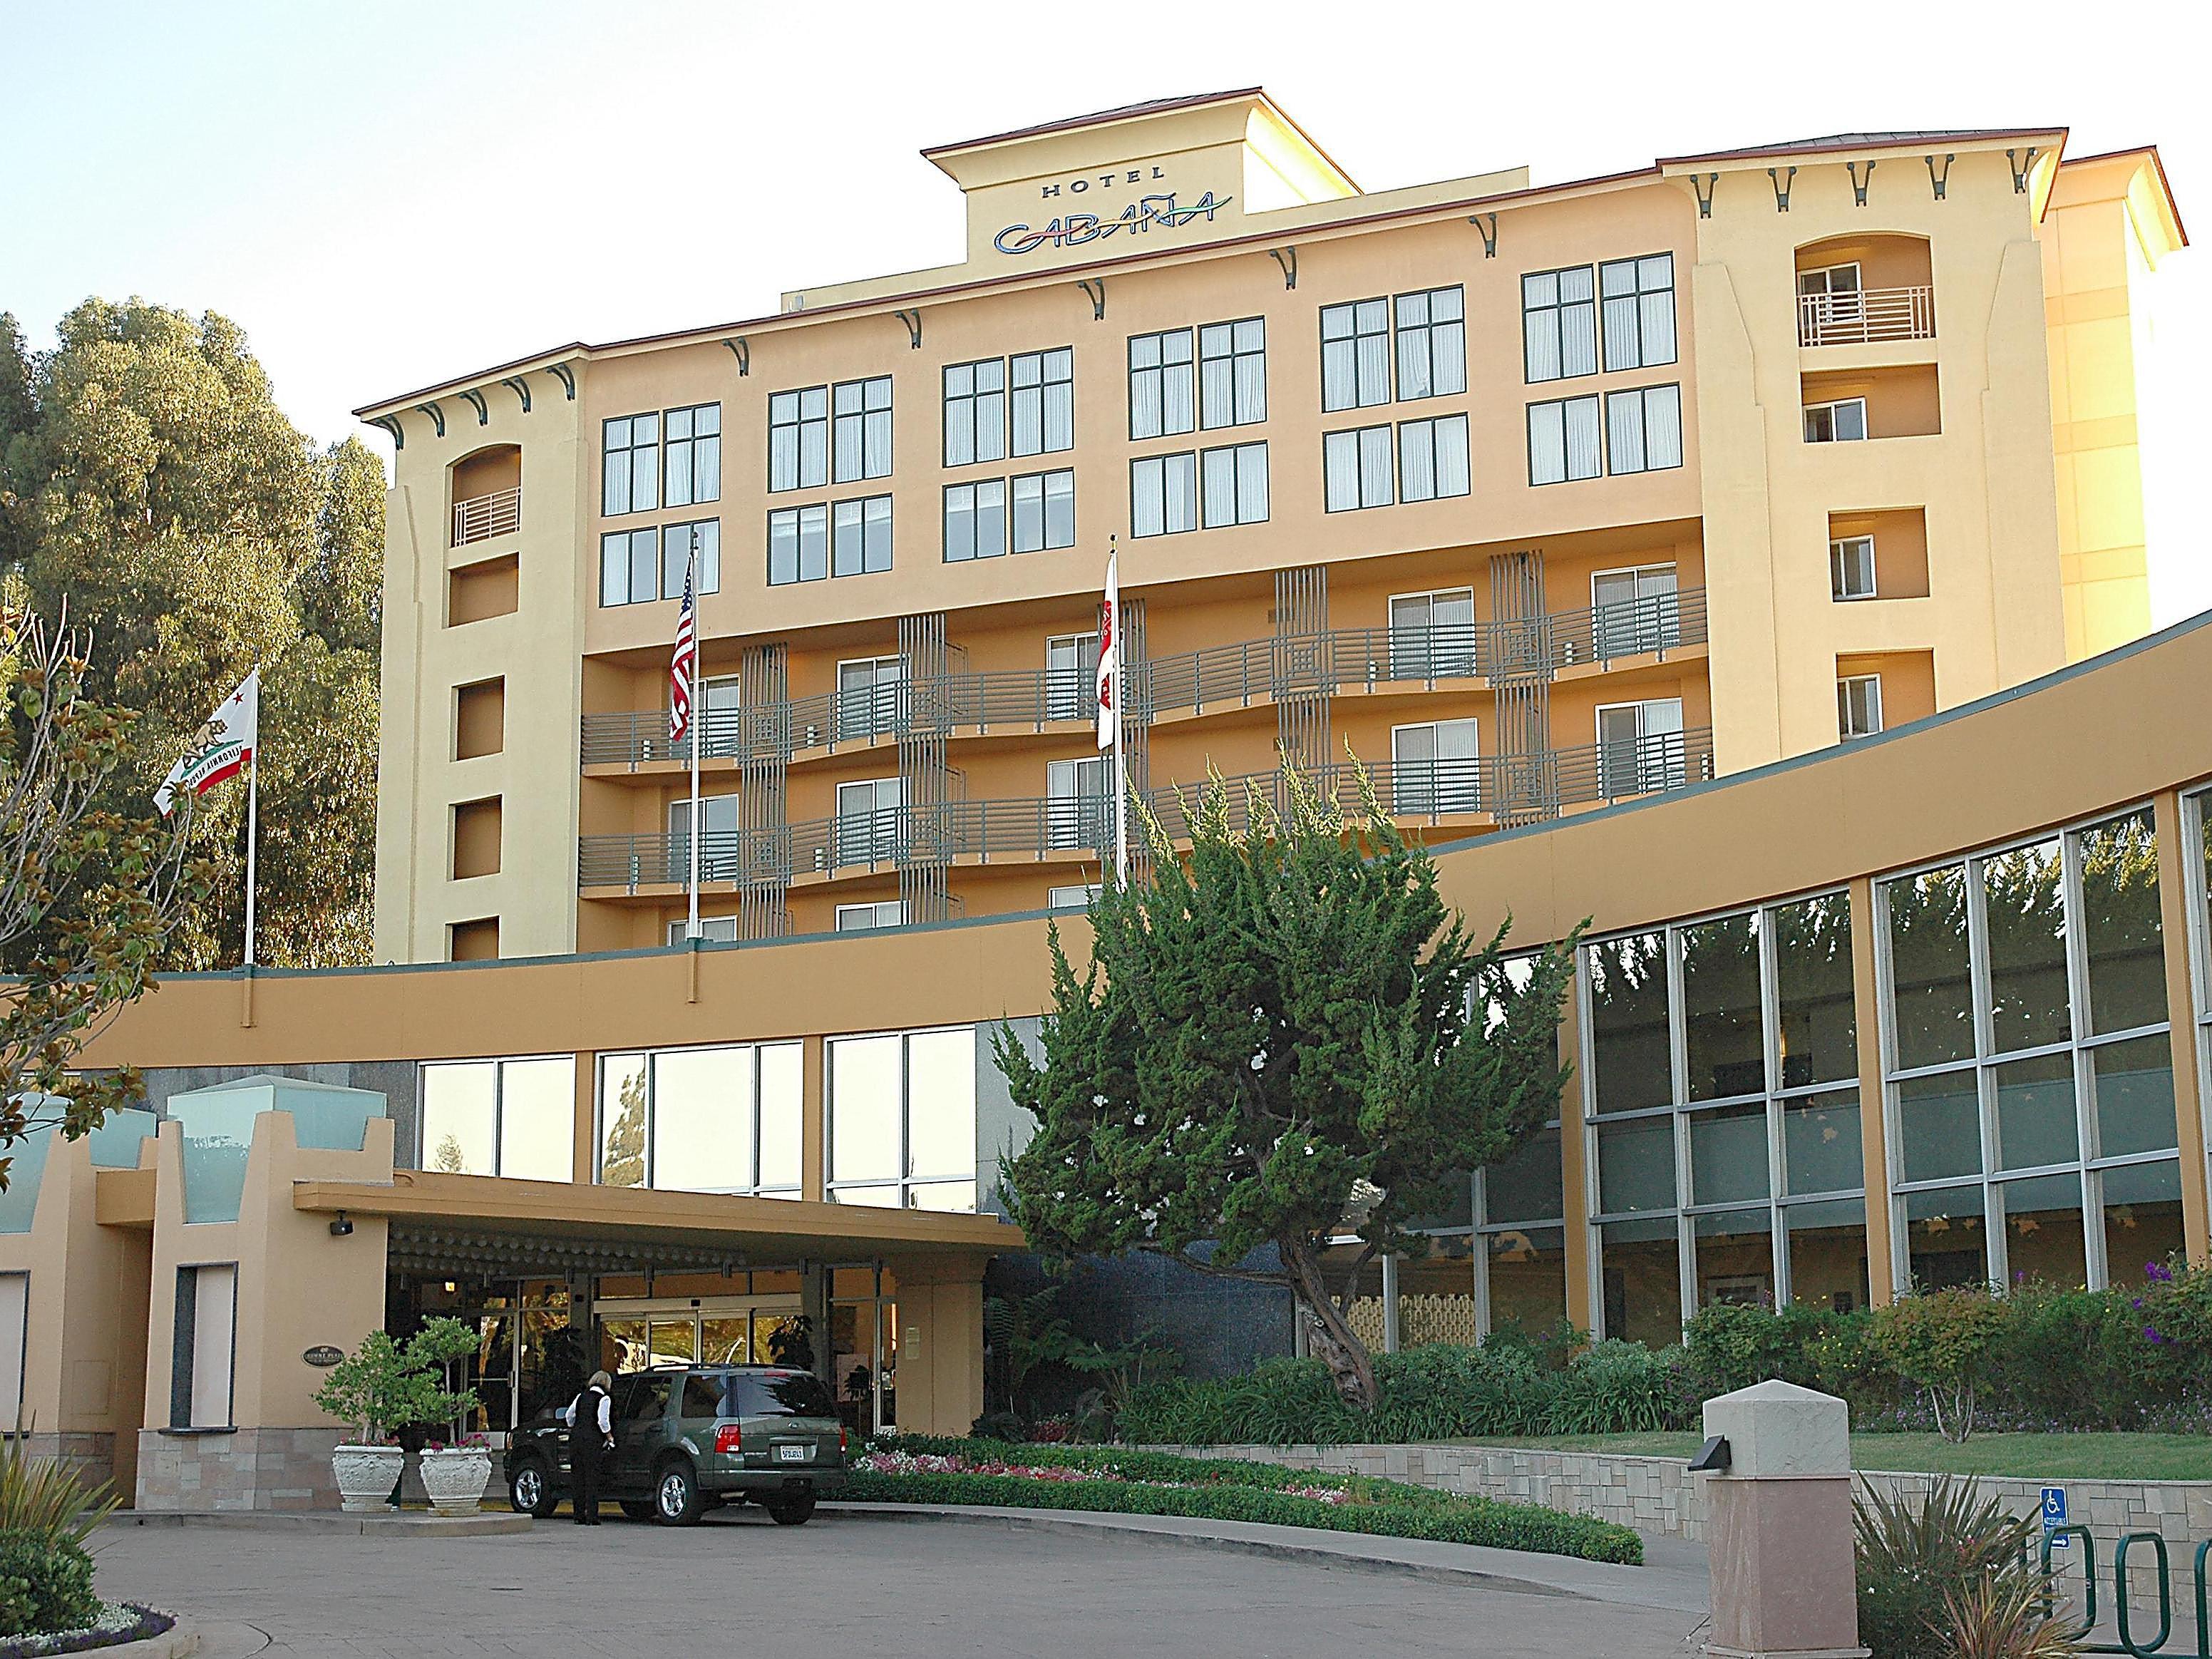 Palo Alto Hotels | Crowne Plaza Palo Alto